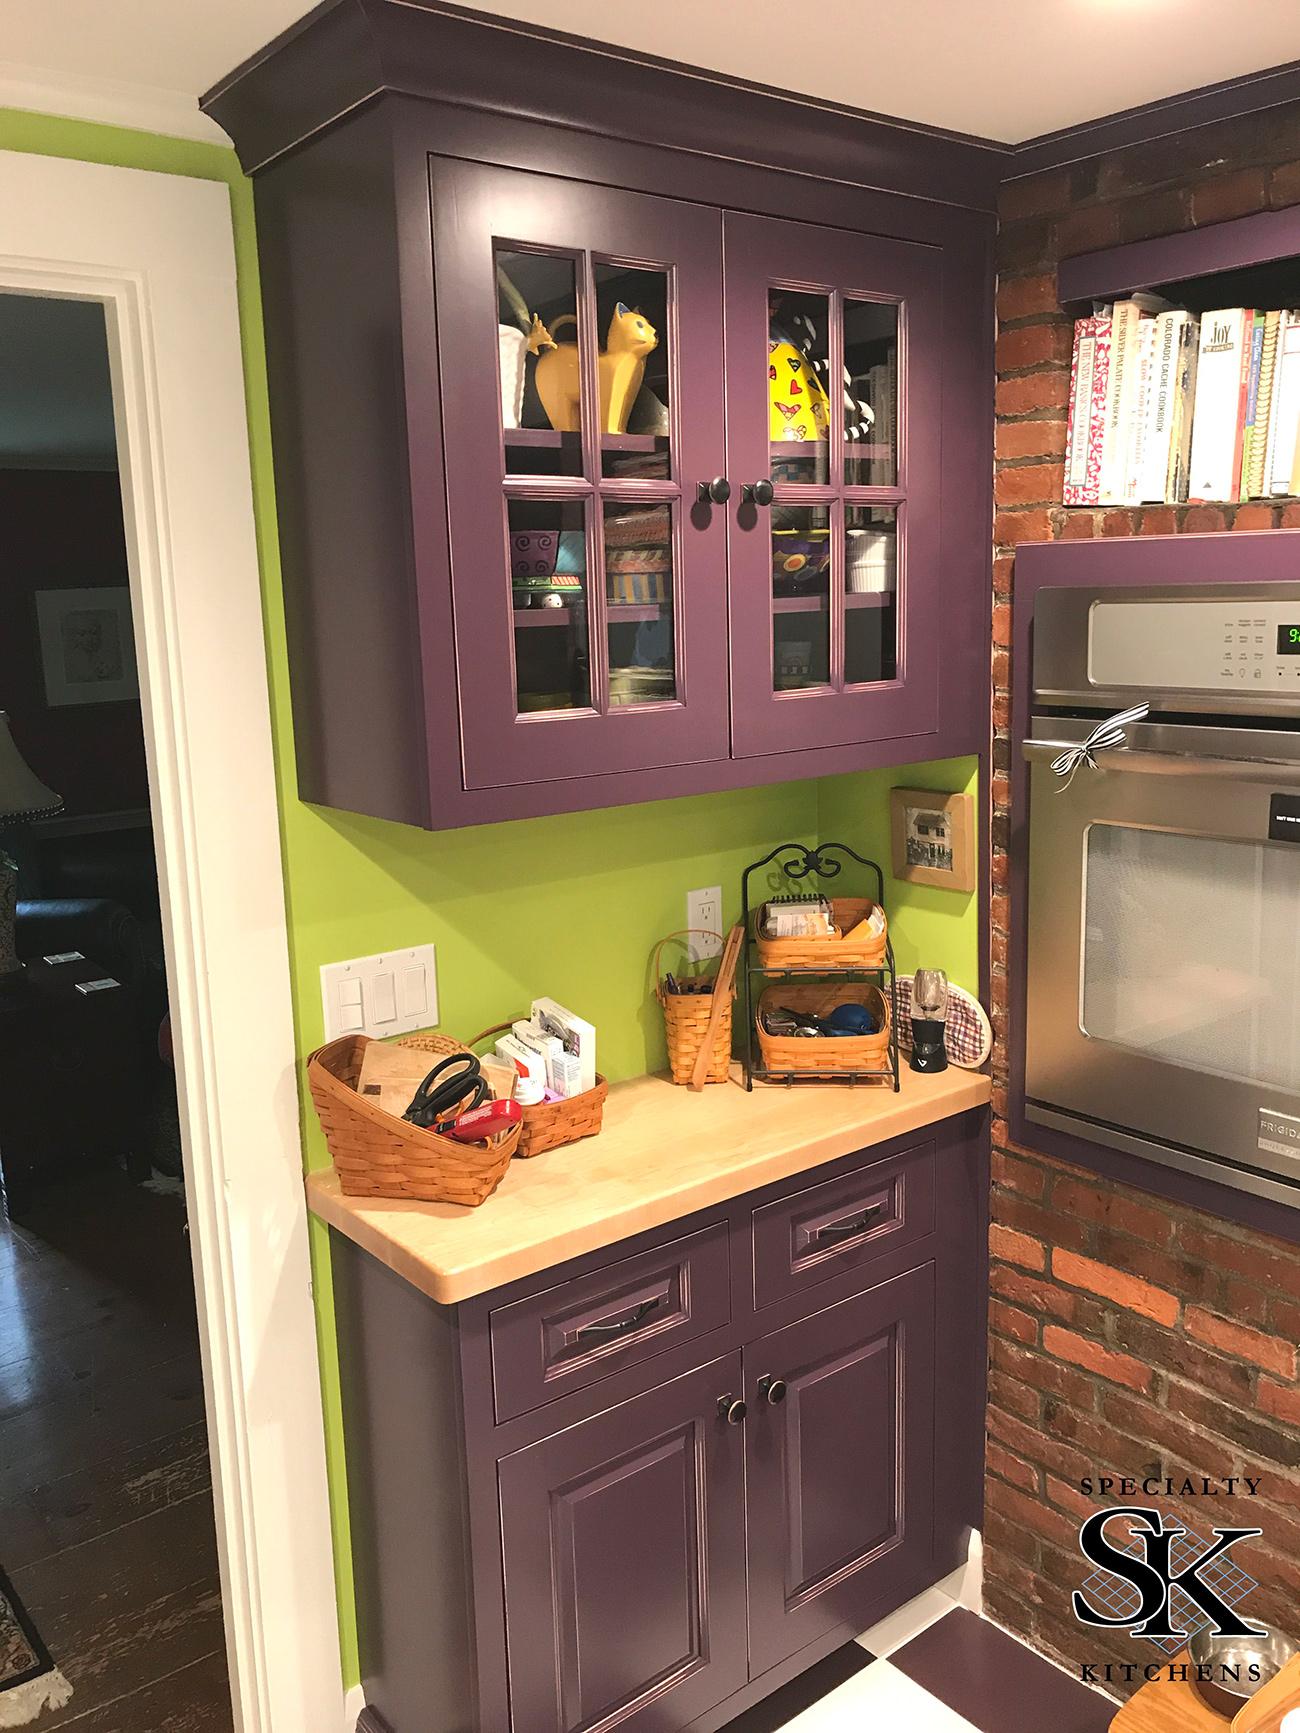 Http://www.specialtykitchens.com/images/kitchens Showcase /Bradbury/Bradbury L